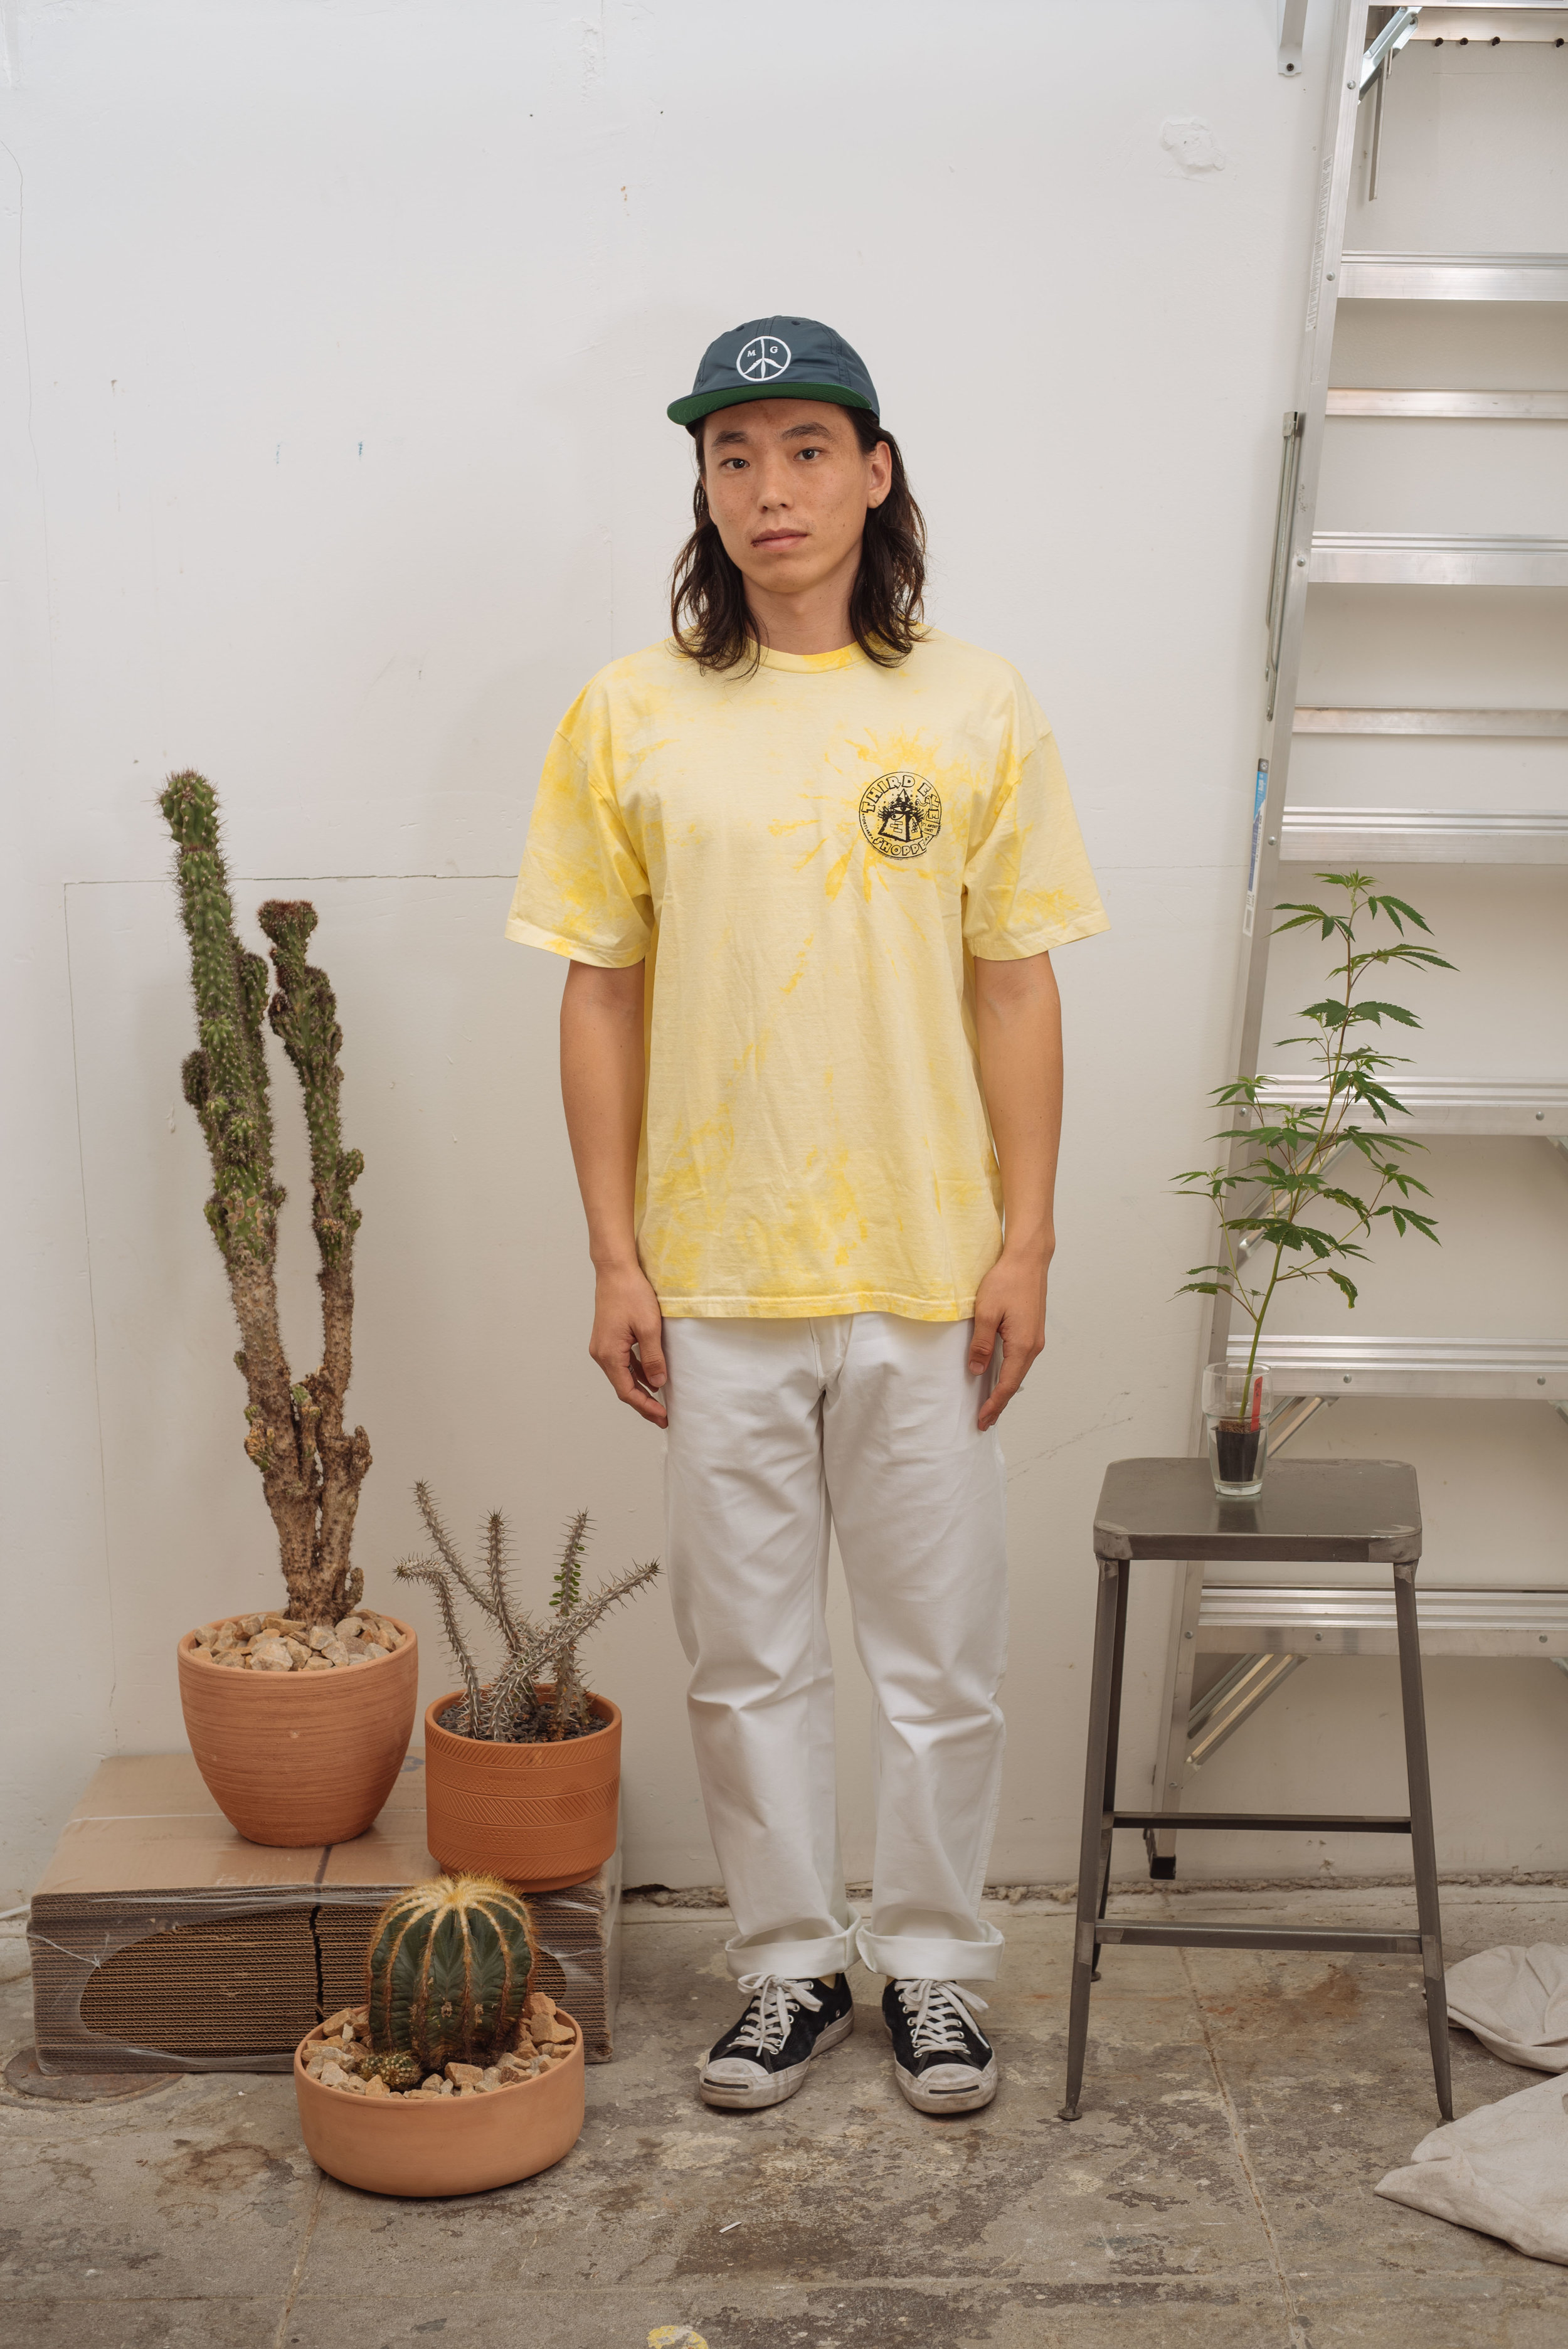 Satin Peace Logo Cap - Navy   3rd Eye Tee - Yellow Tie Dye   Green Dickies - White